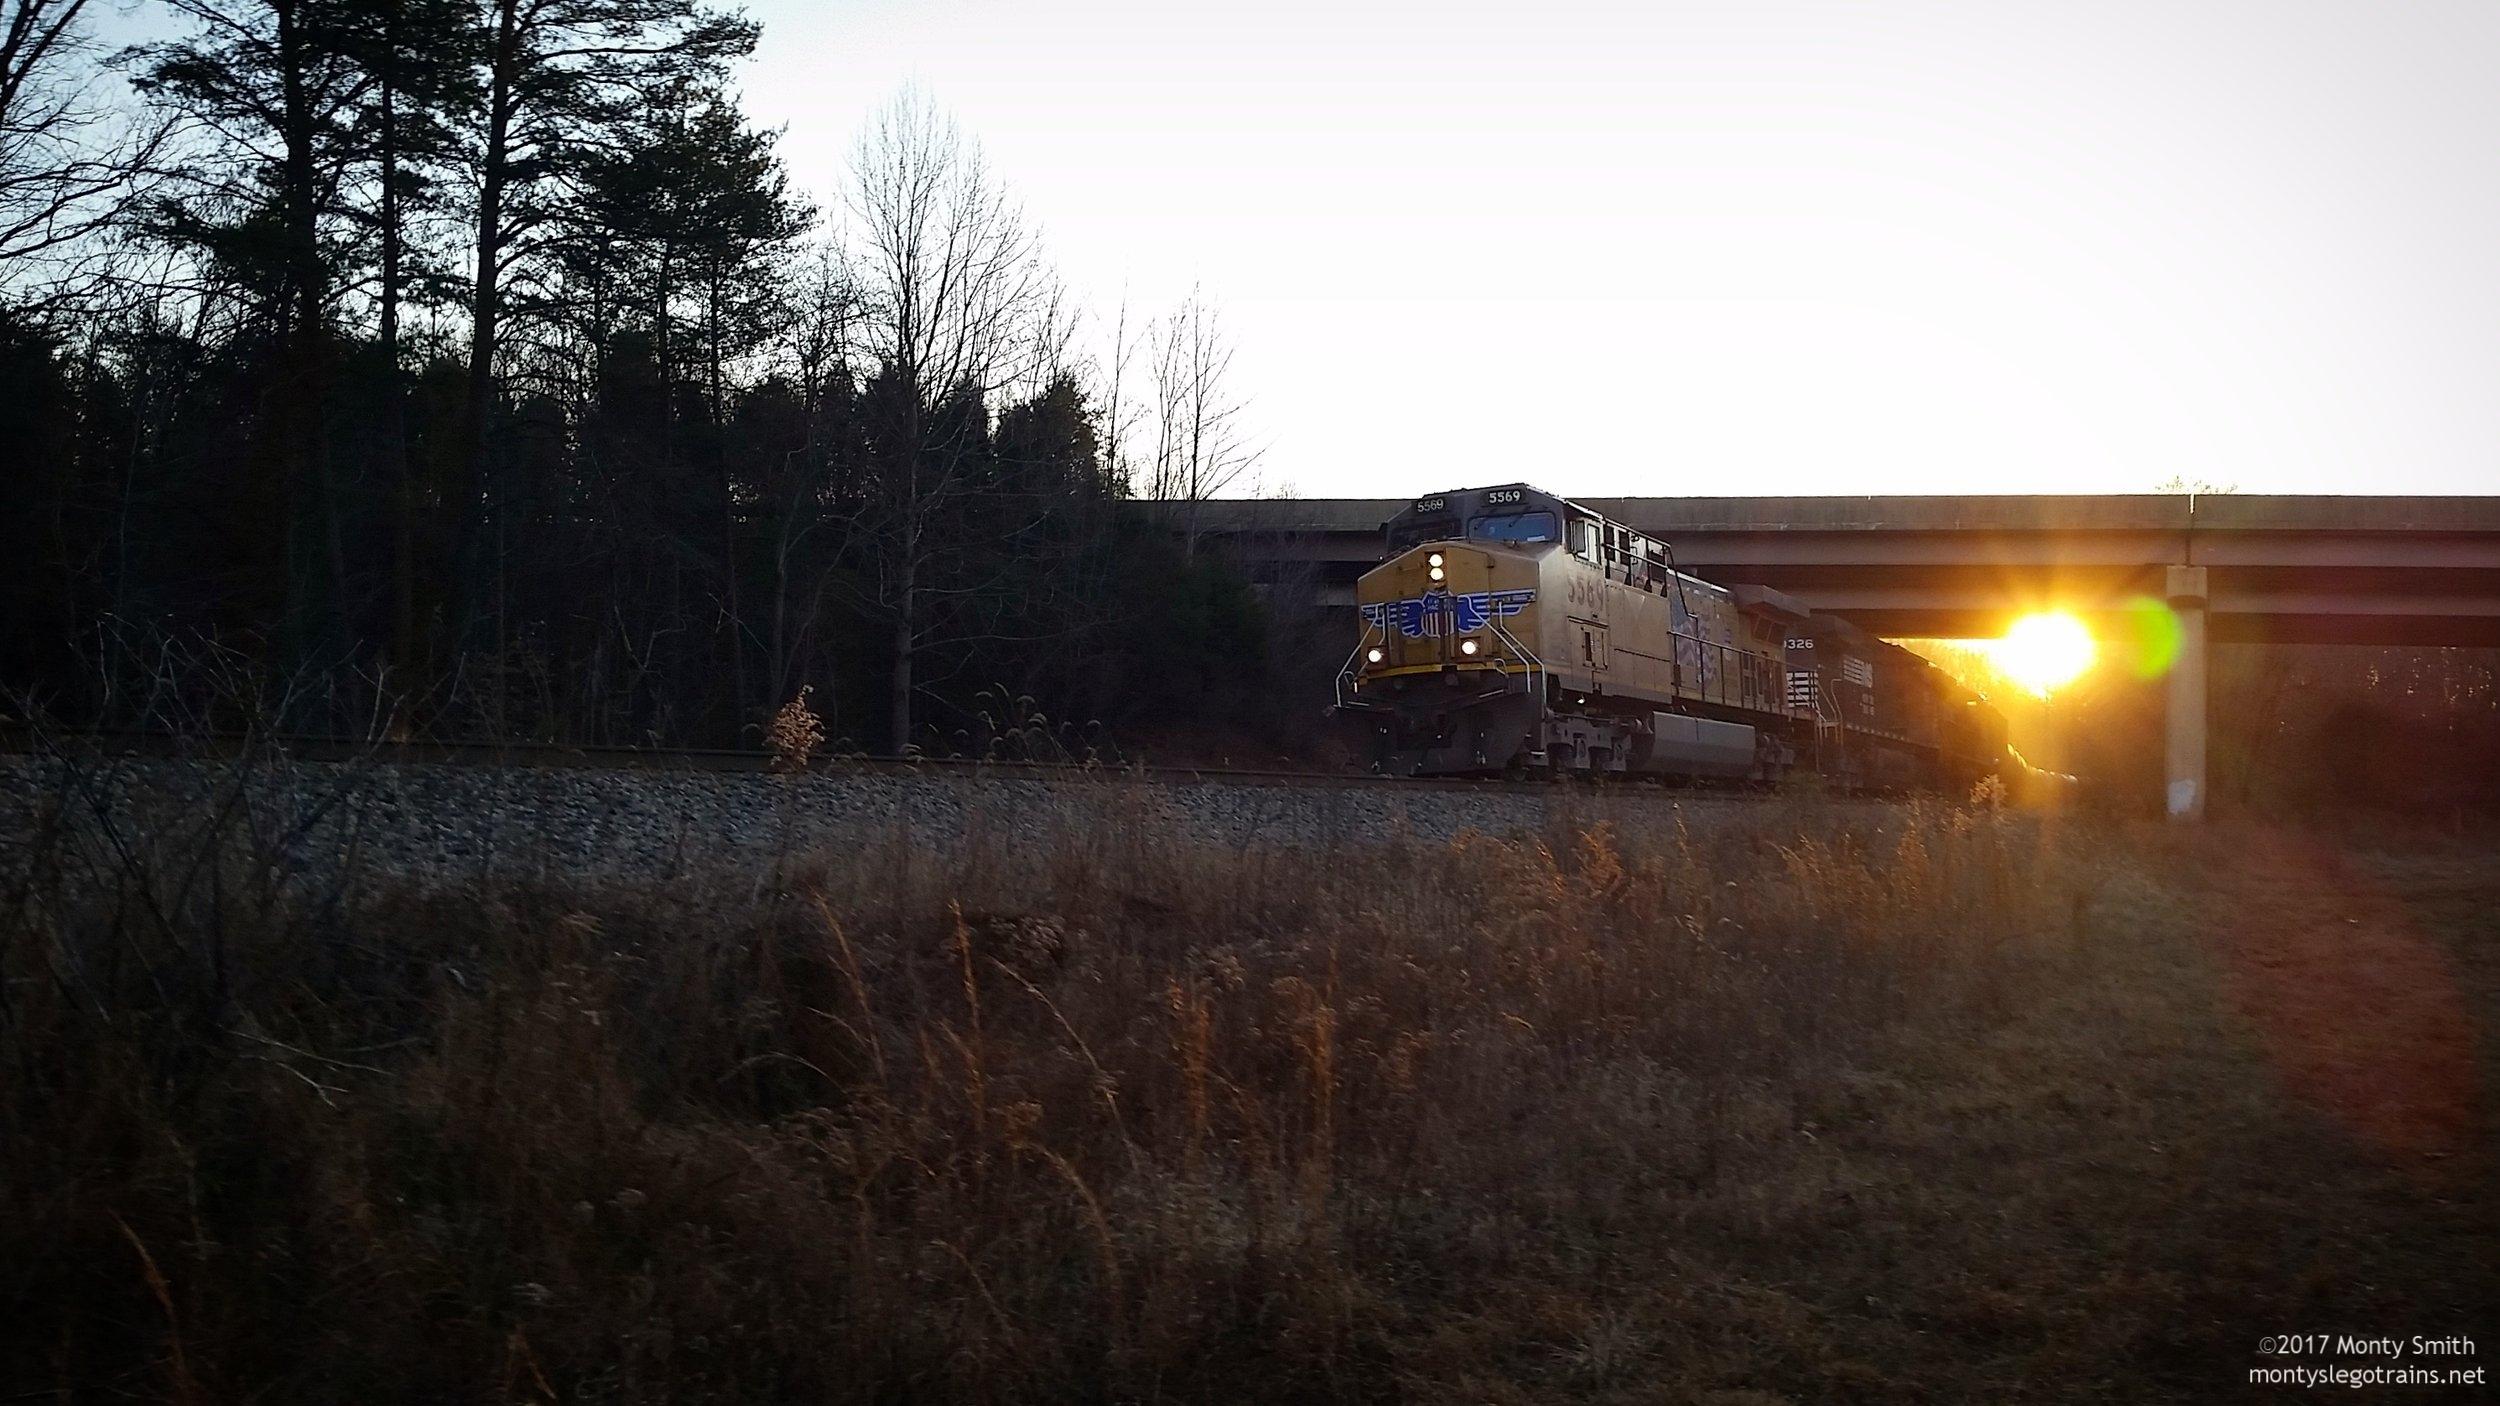 64A roars up the hill through Fairfax Station, VA at sunset.